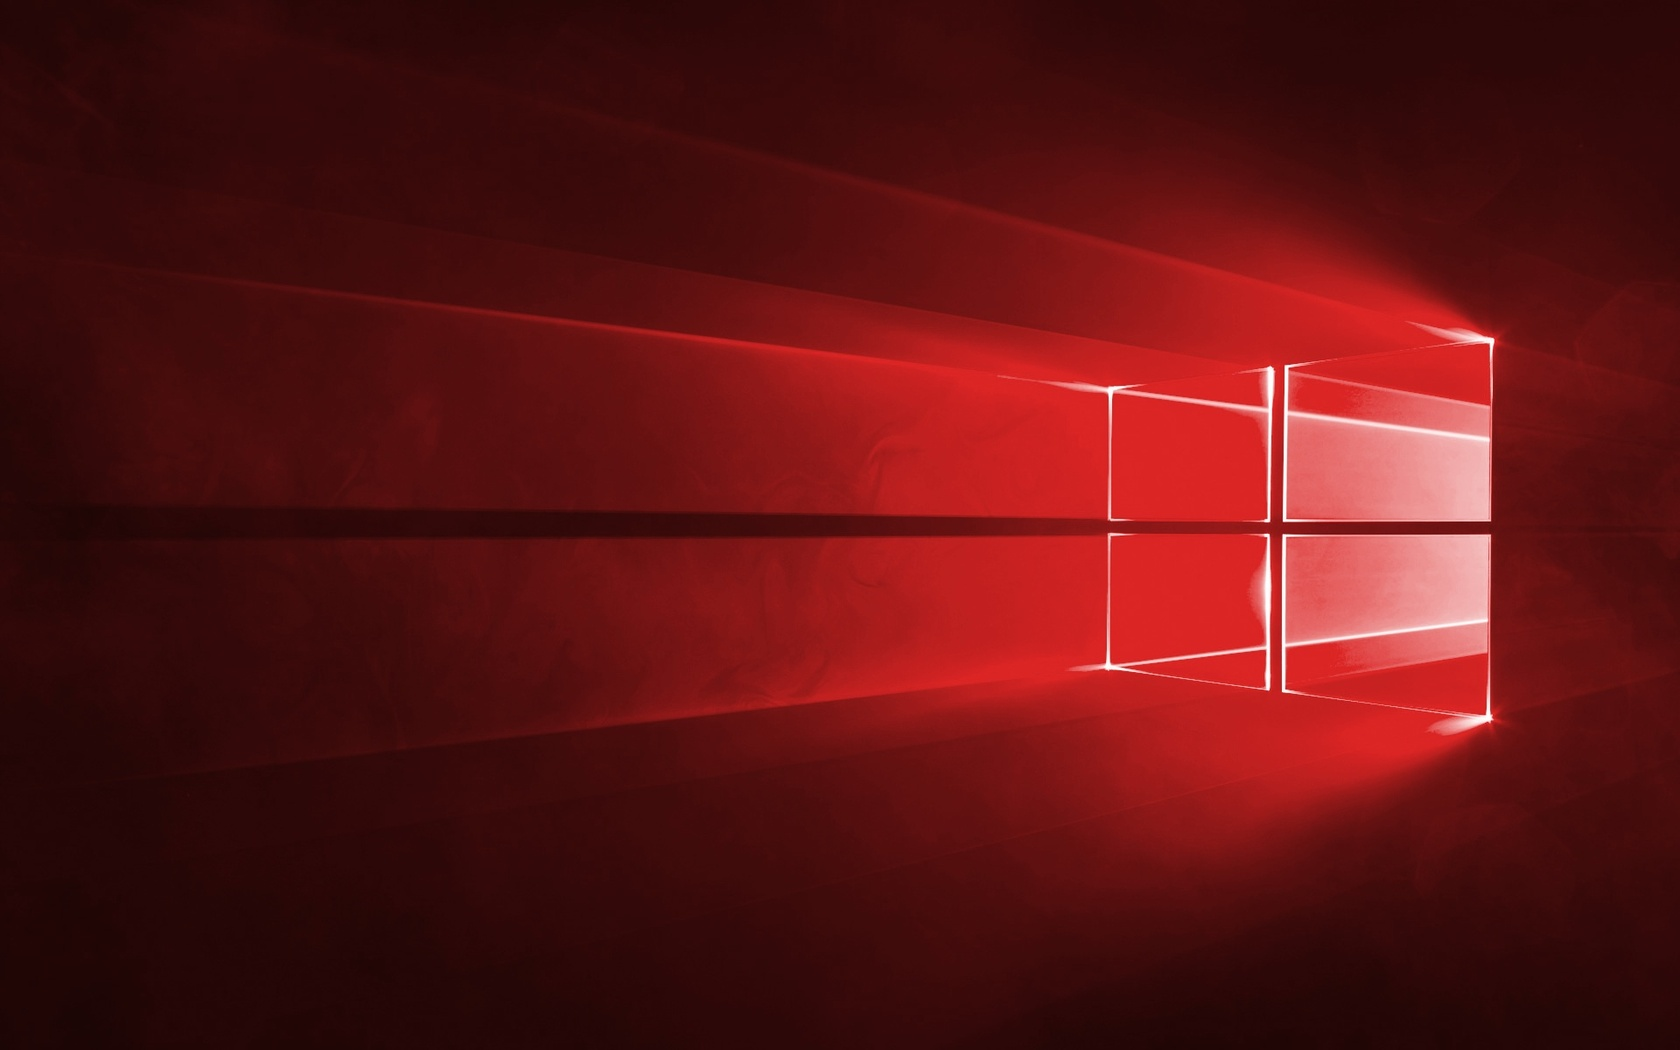 Red Windows 10 wallpaper #37885